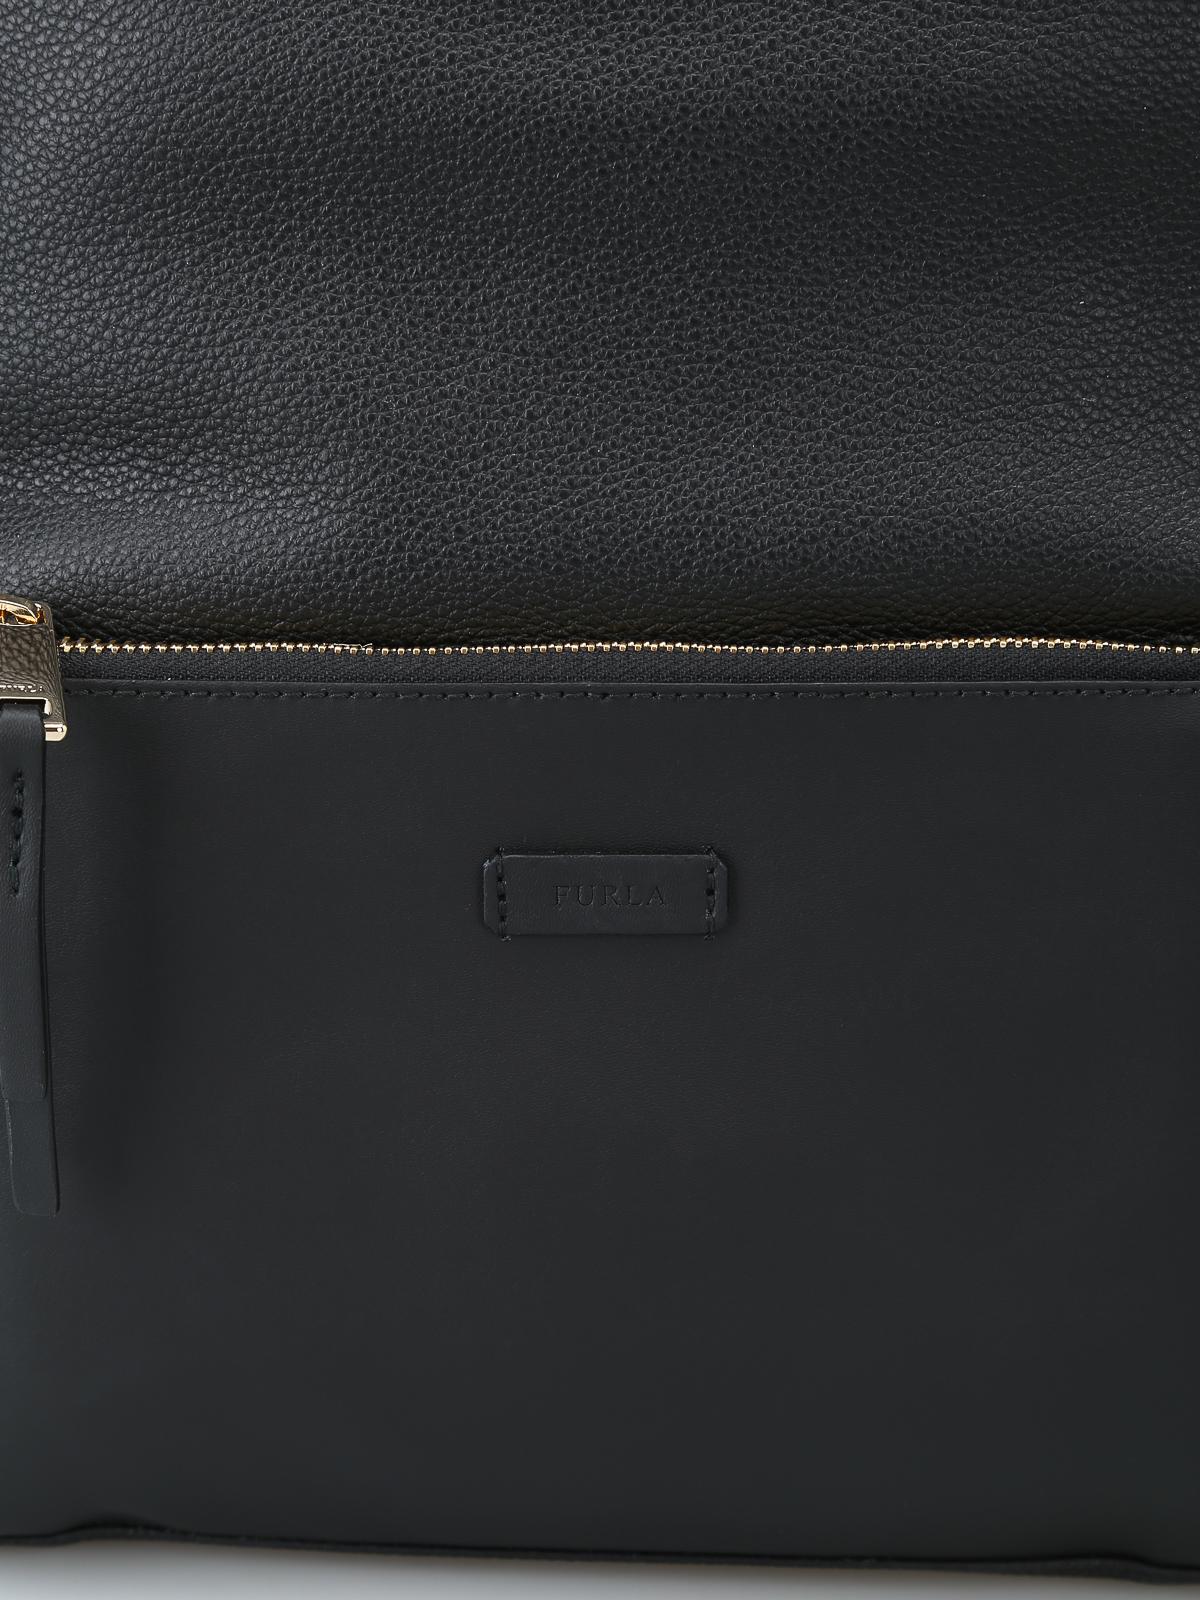 Furla Giudecca Small Dome Backpack Backpacks 981770 Onyx Authentic Shop Online